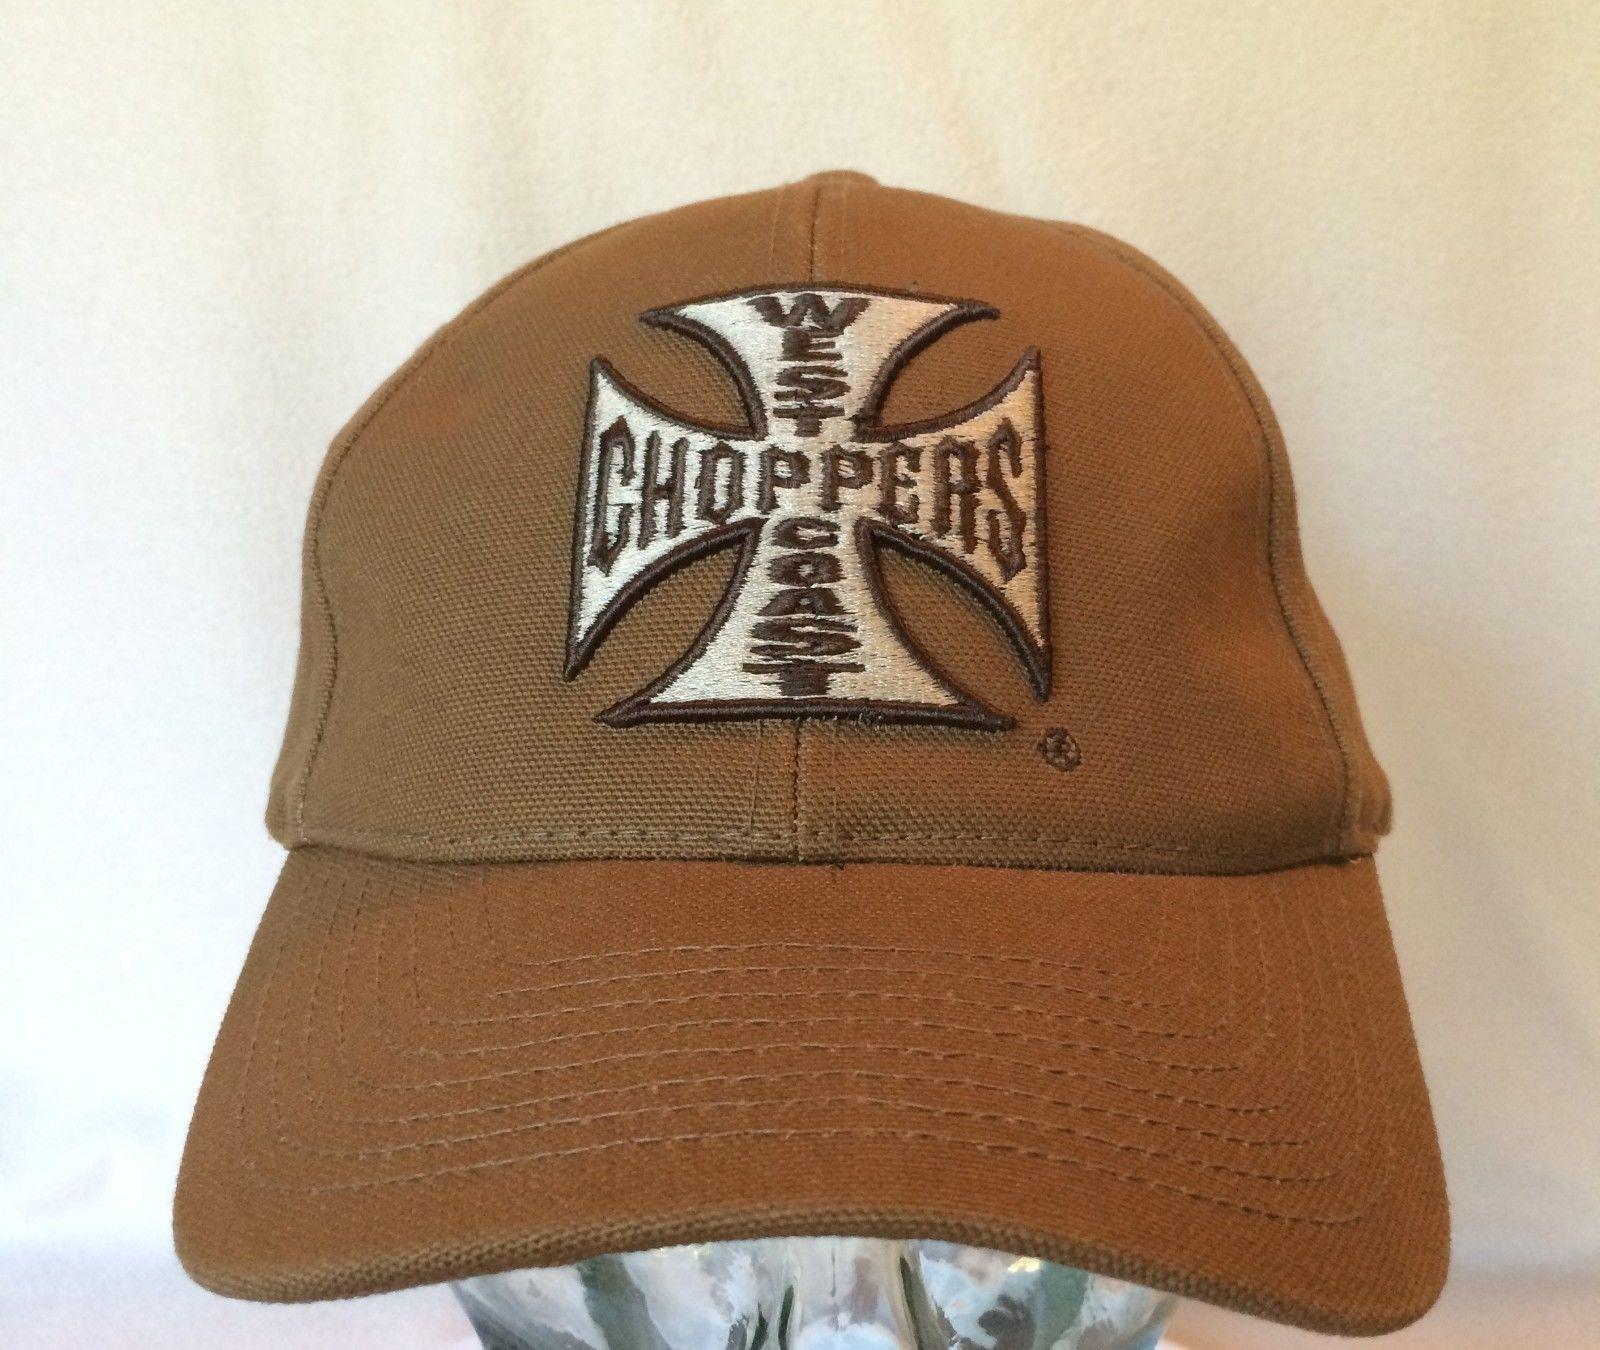 West Coast Choppers Hat Cap Maltese Cross Tan Jesse James Snapback Motorcycle